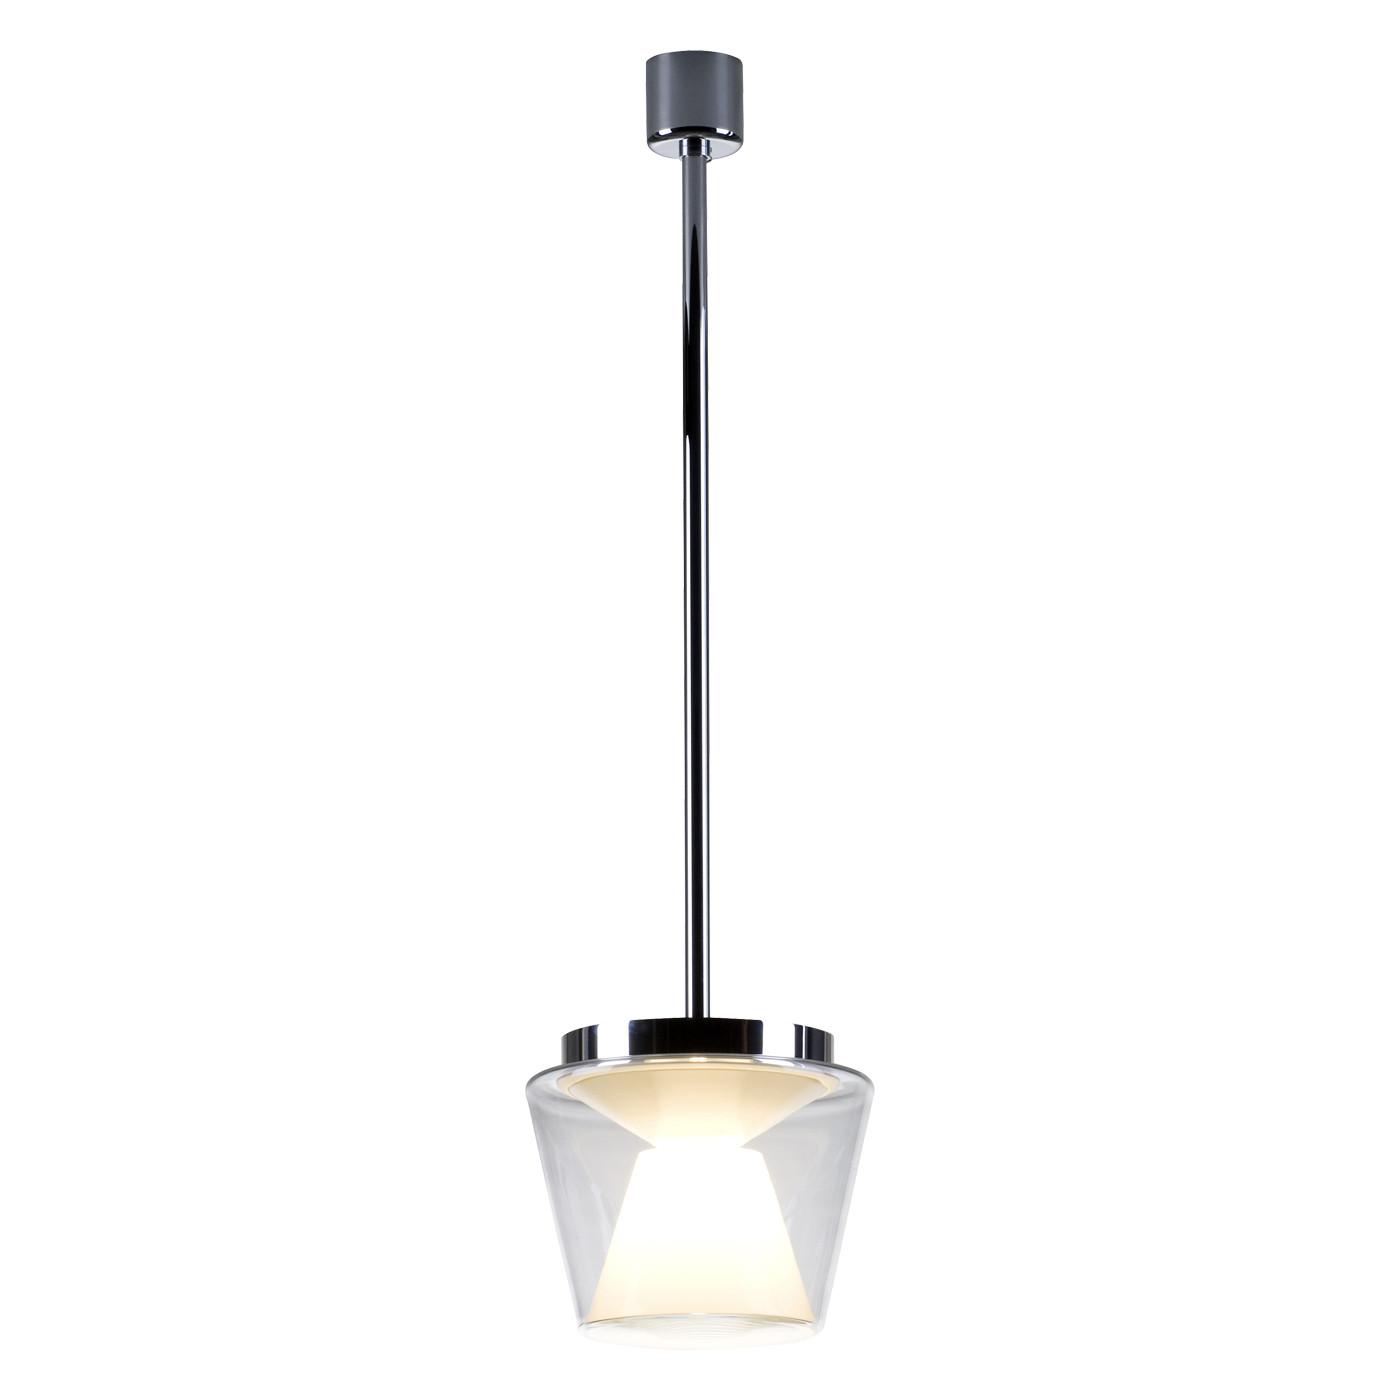 Serien Lighting Annex Suspension L LED, 34W